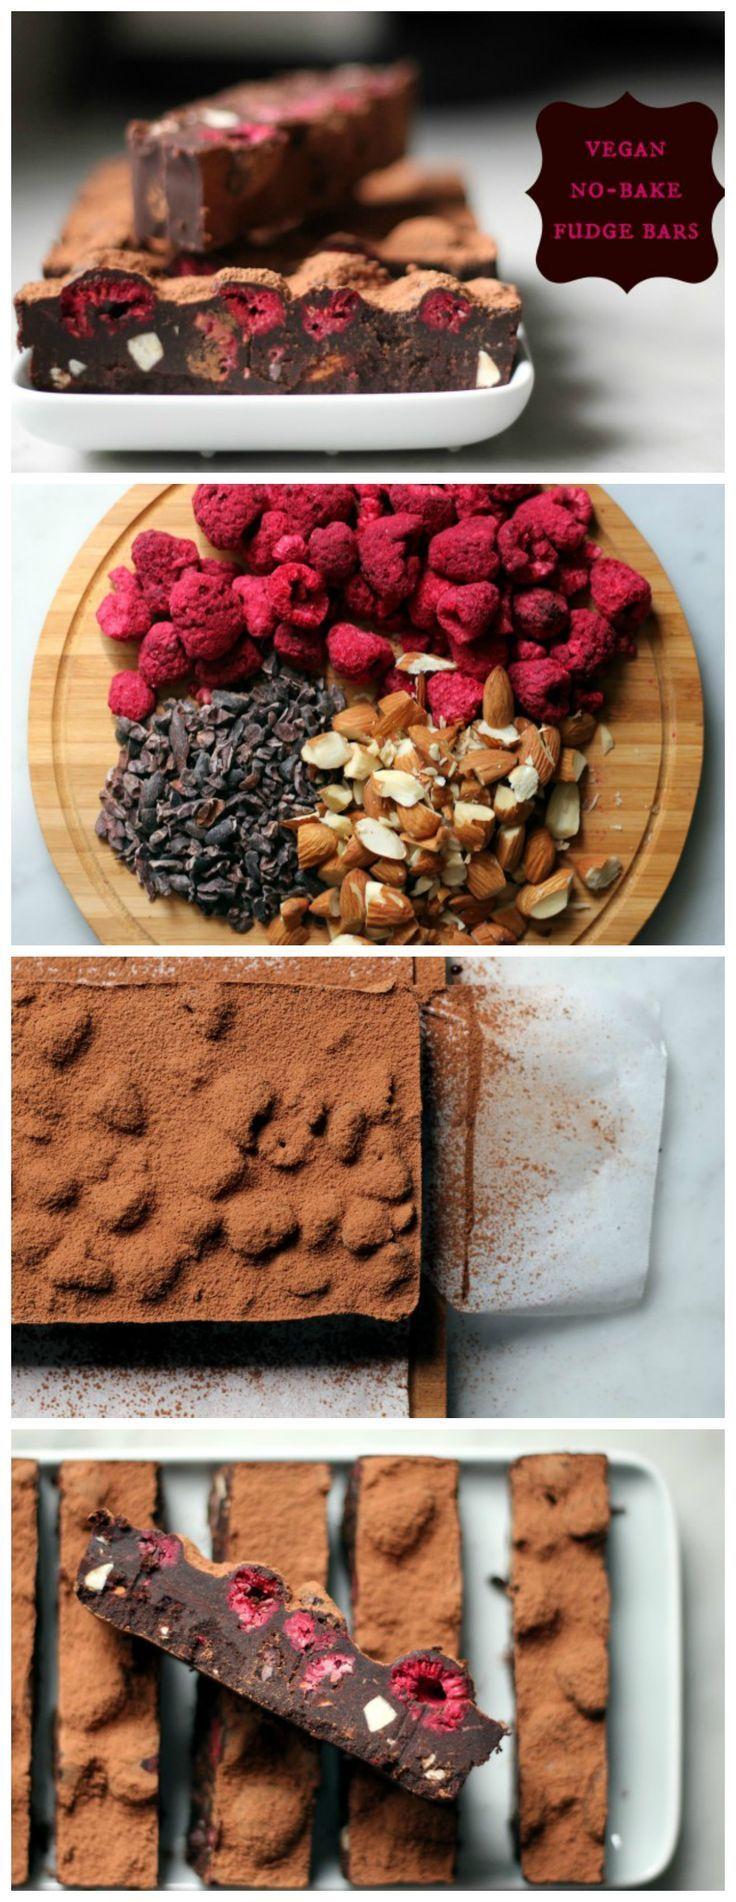 These no-bake, vegan, gluten-free fudge bars are delicious! (Coconut butter)